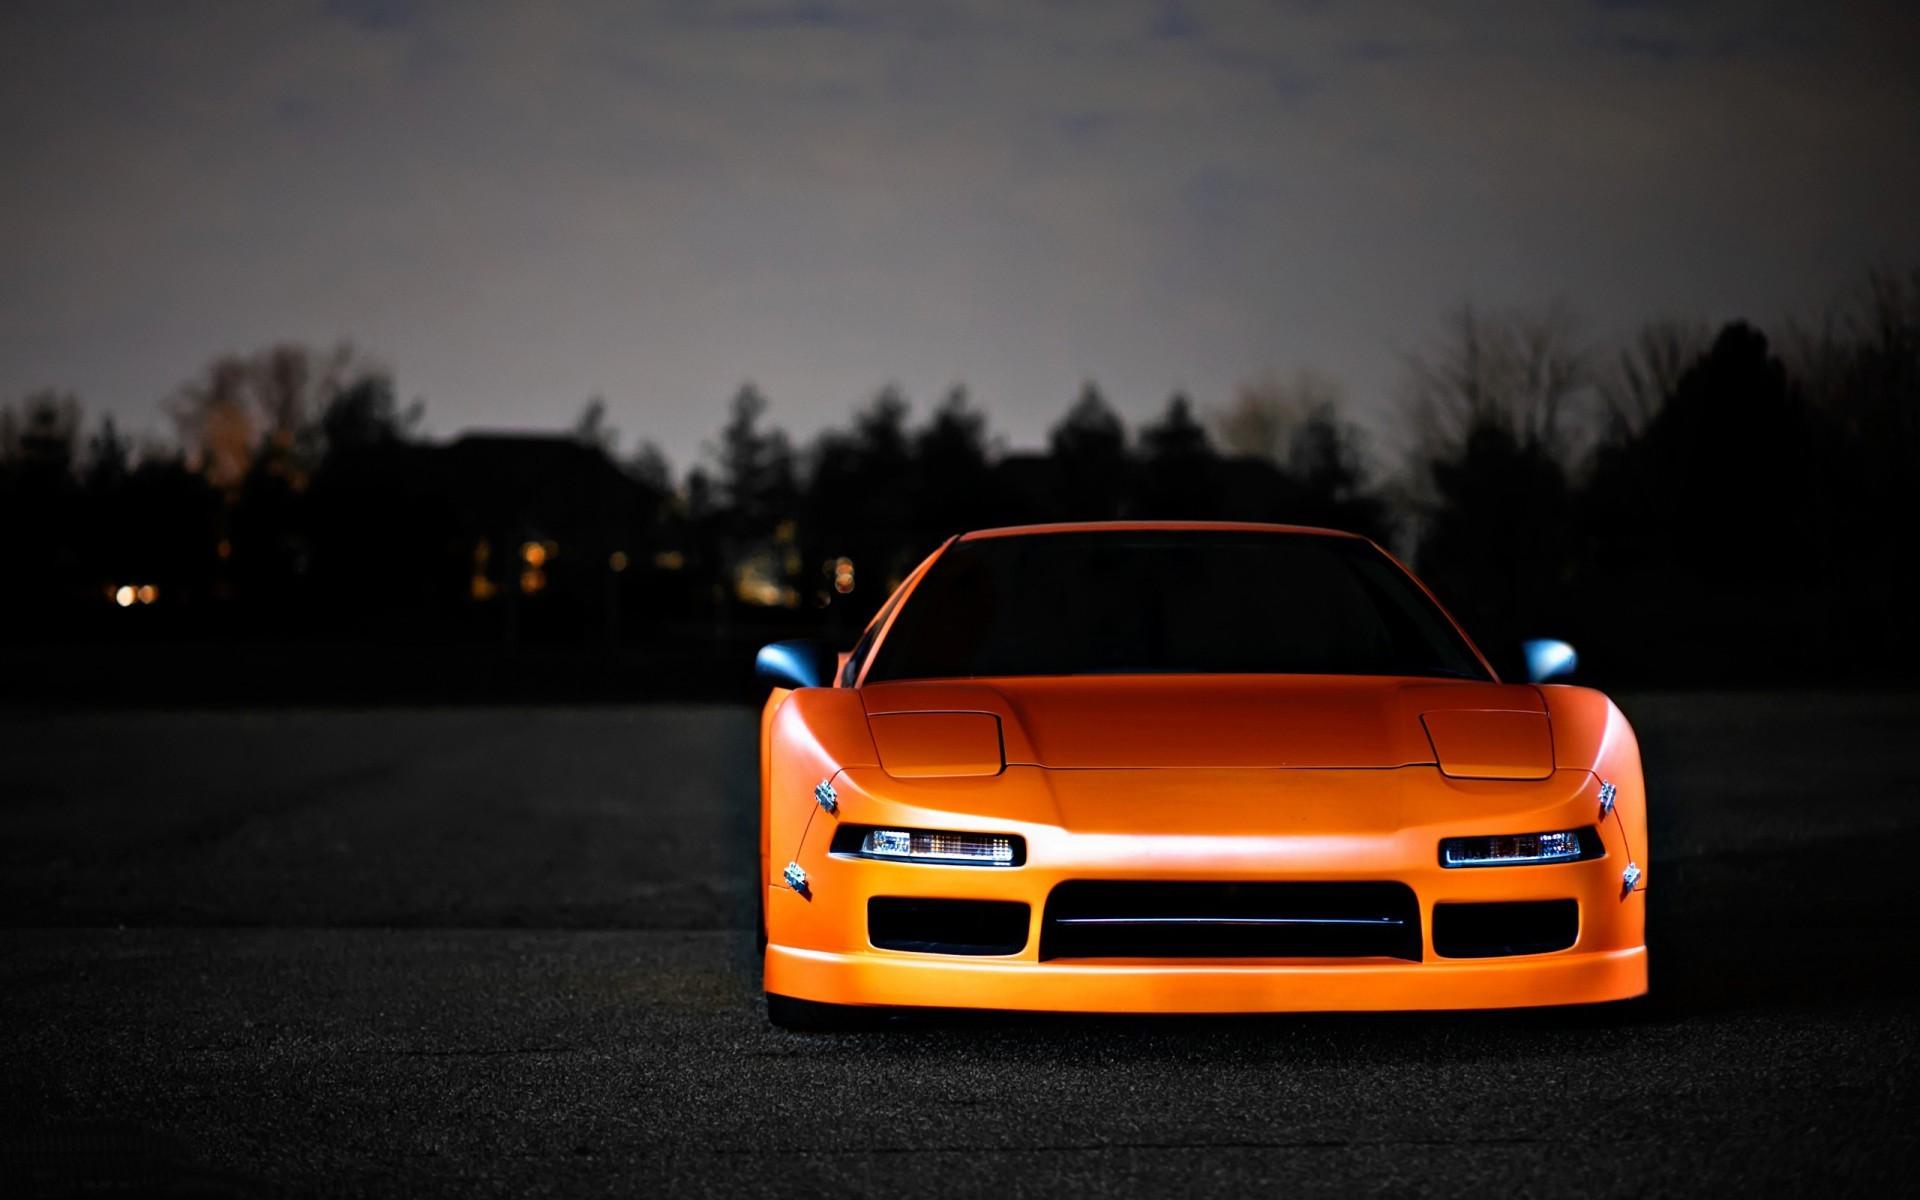 Wallpaper : JDM, orange cars, sports car, Honda NSX, coupe